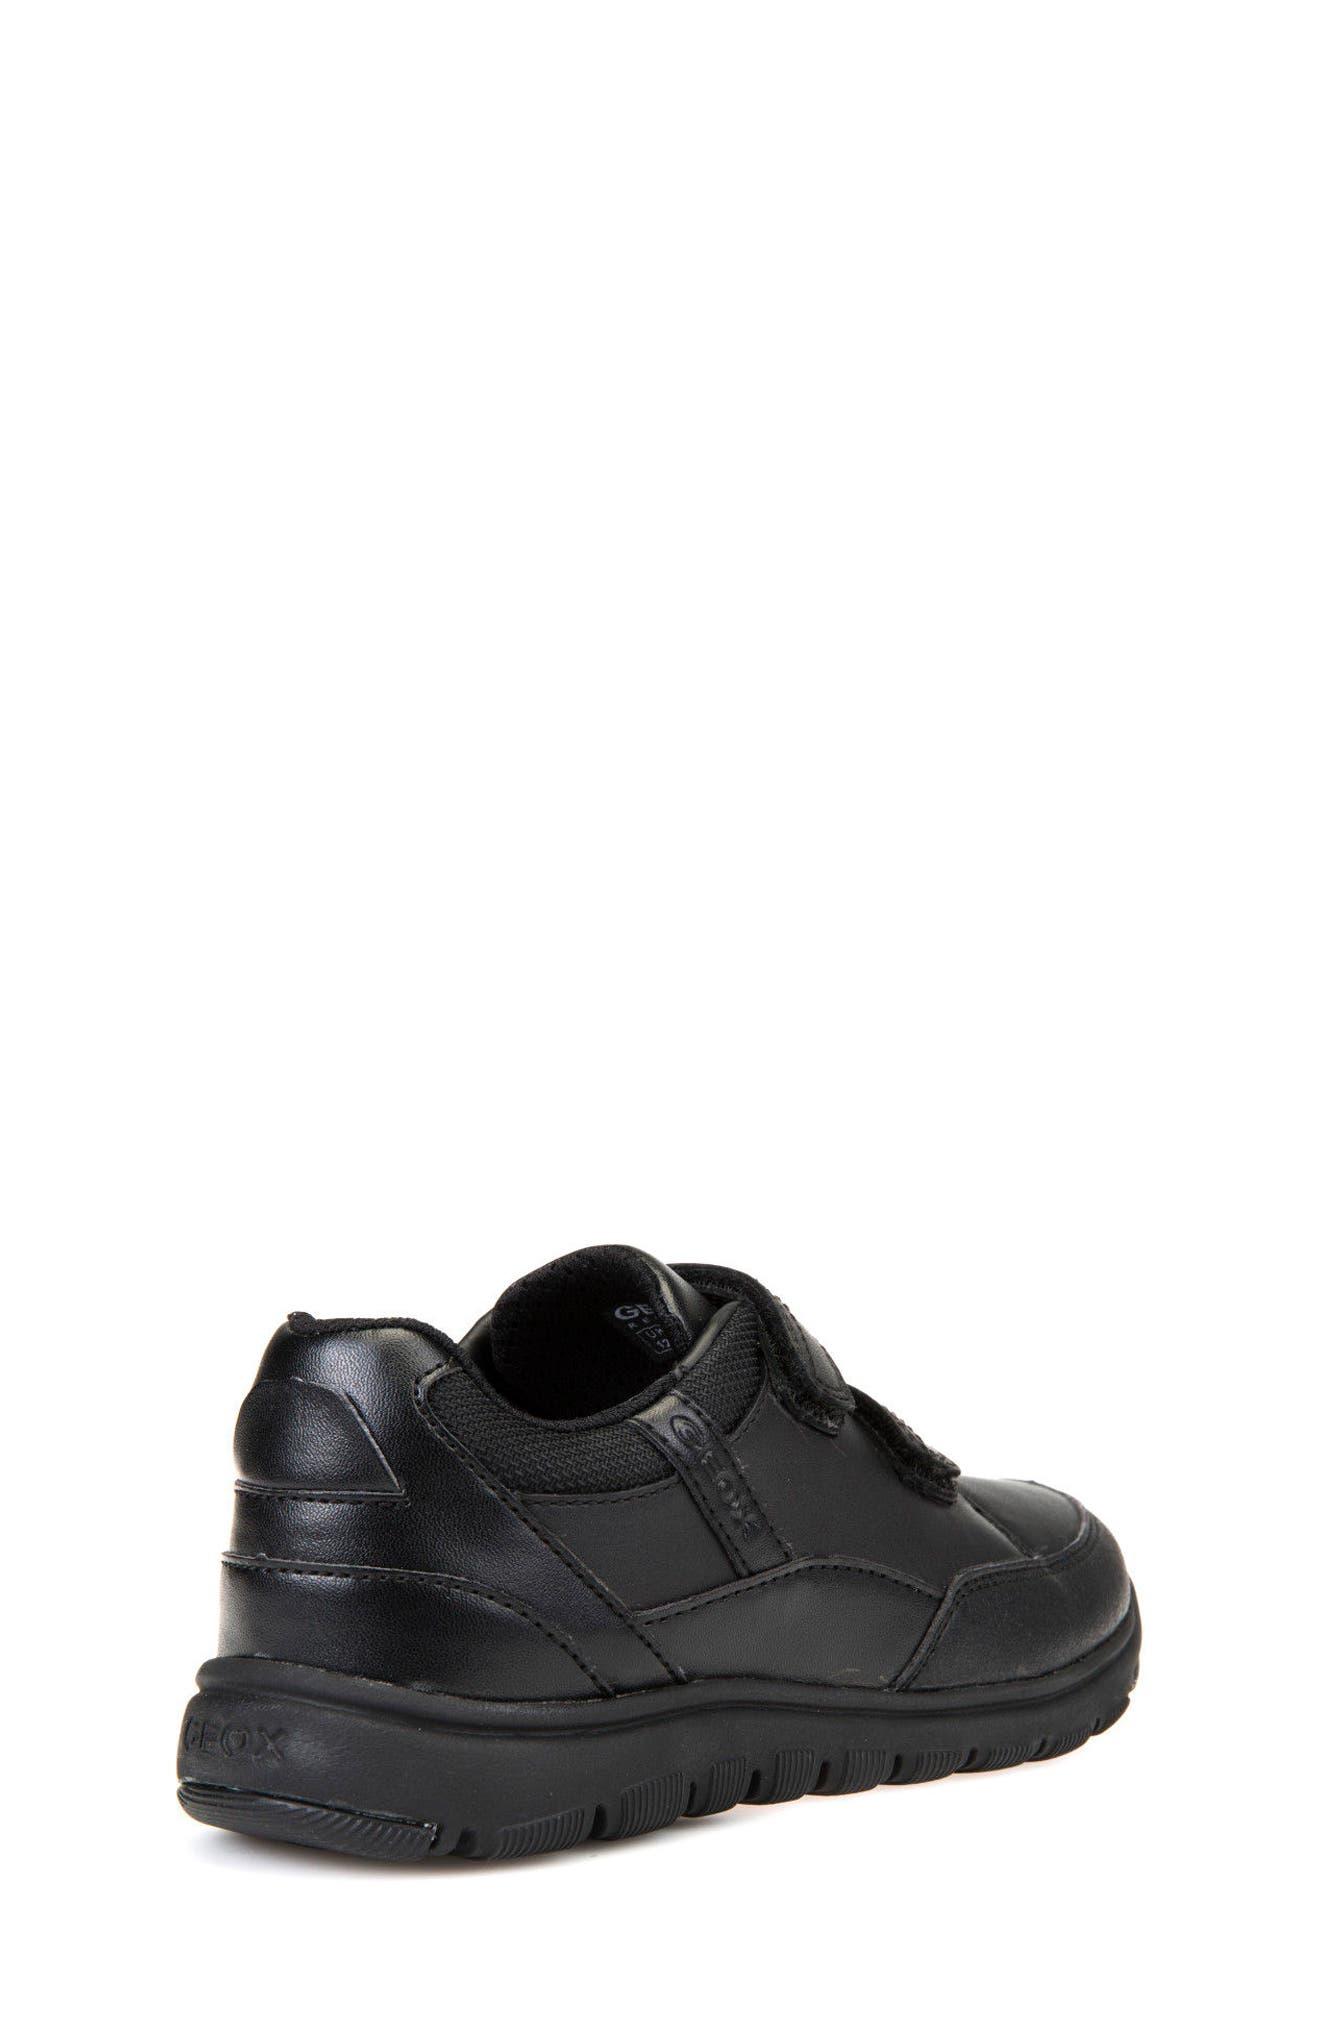 Xunday Low Top Sneaker,                             Alternate thumbnail 2, color,                             BLACK